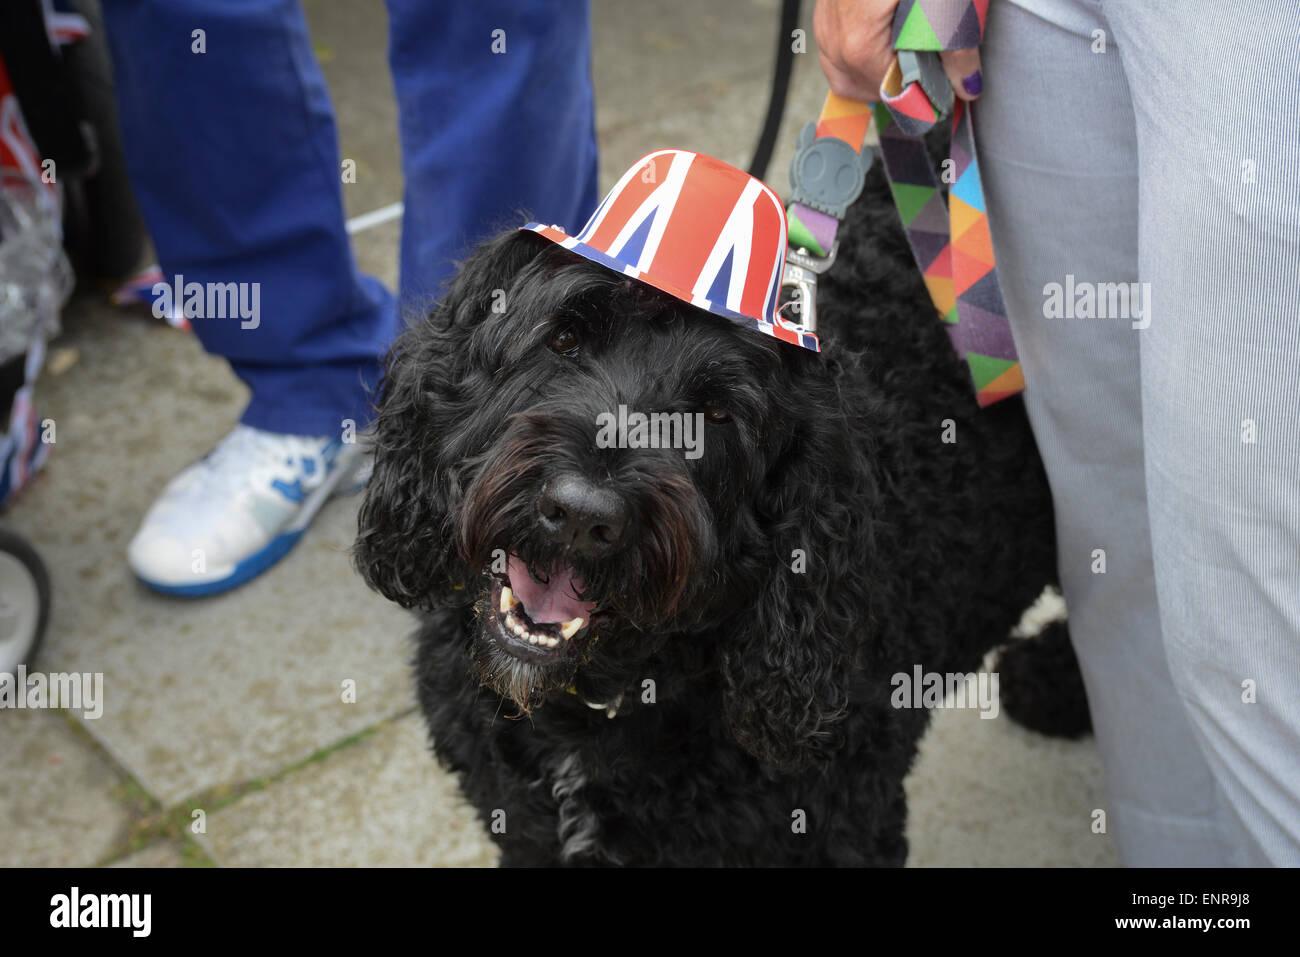 Union Jack Hat Stockfotos & Union Jack Hat Bilder - Alamy